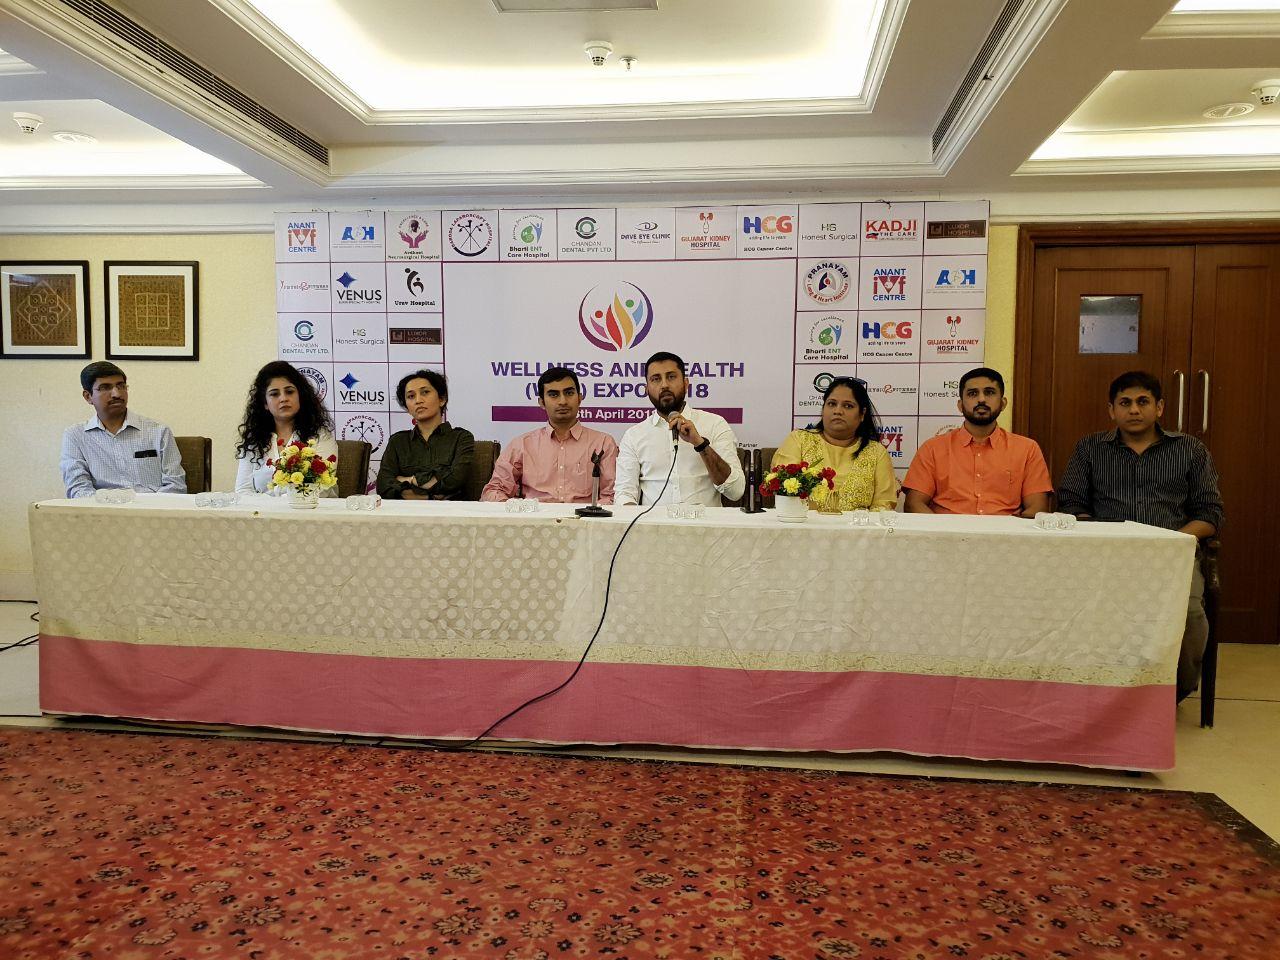 WAH Expo to make the Vadodara city fit and healthy